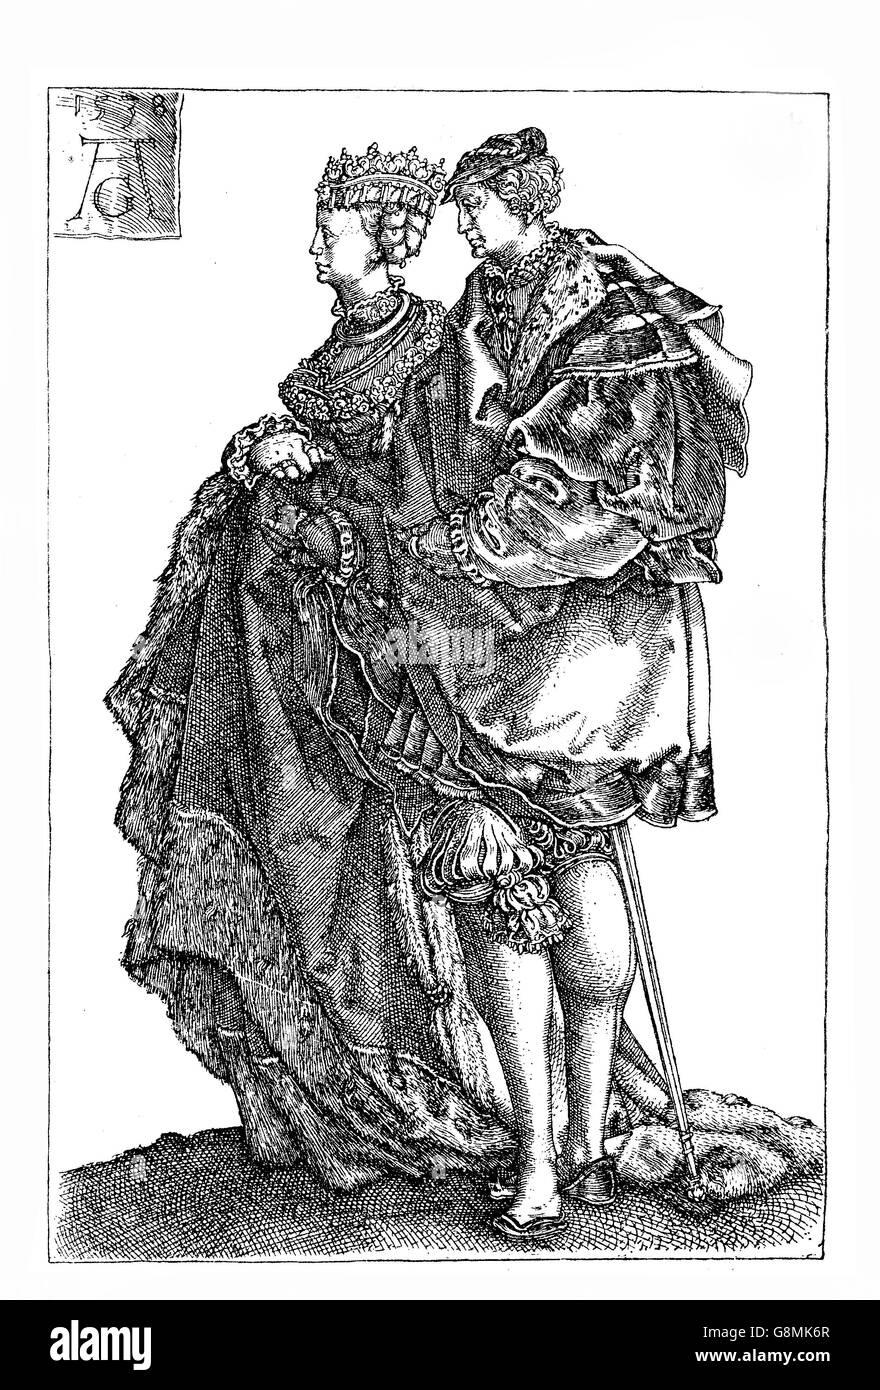 German Renaissance , Heinrich Aldegrever (1502-1555) Marriage Dancers engraving - Stock Image